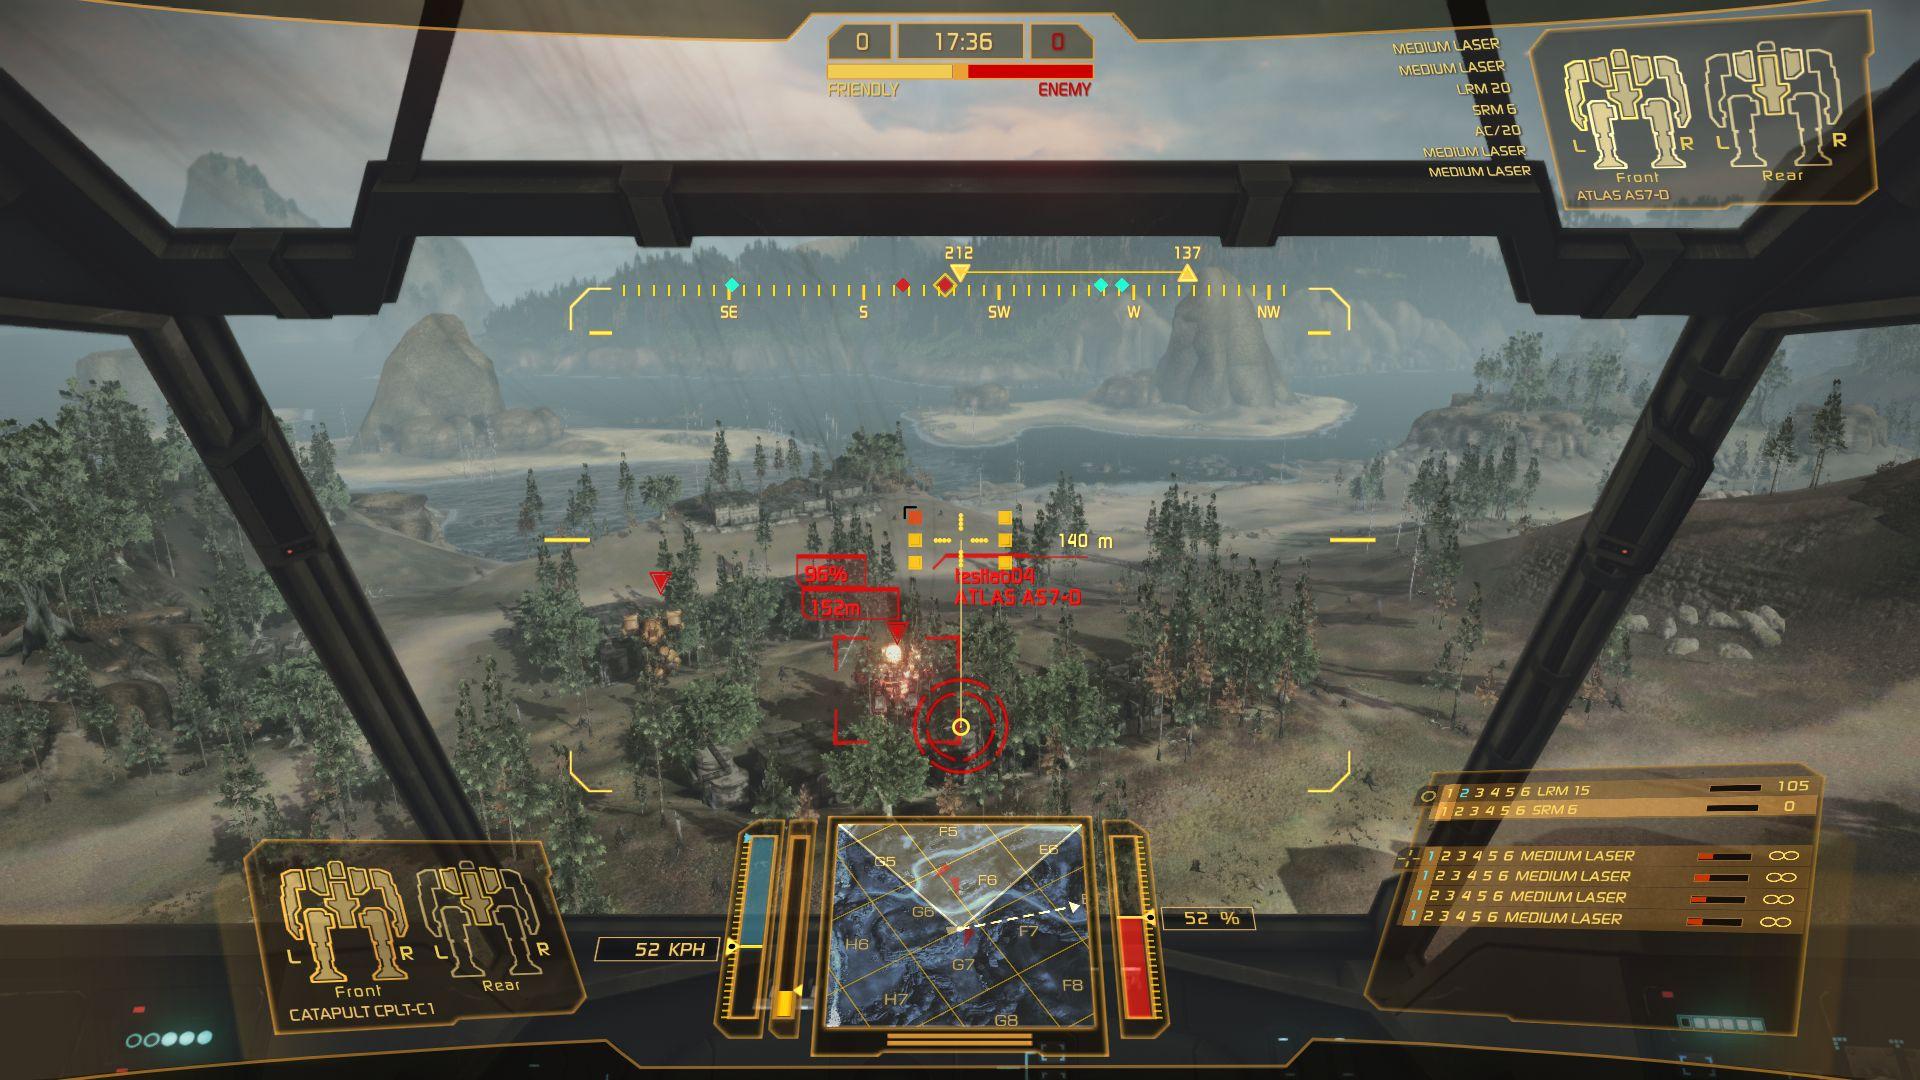 Mechwarrior online builds